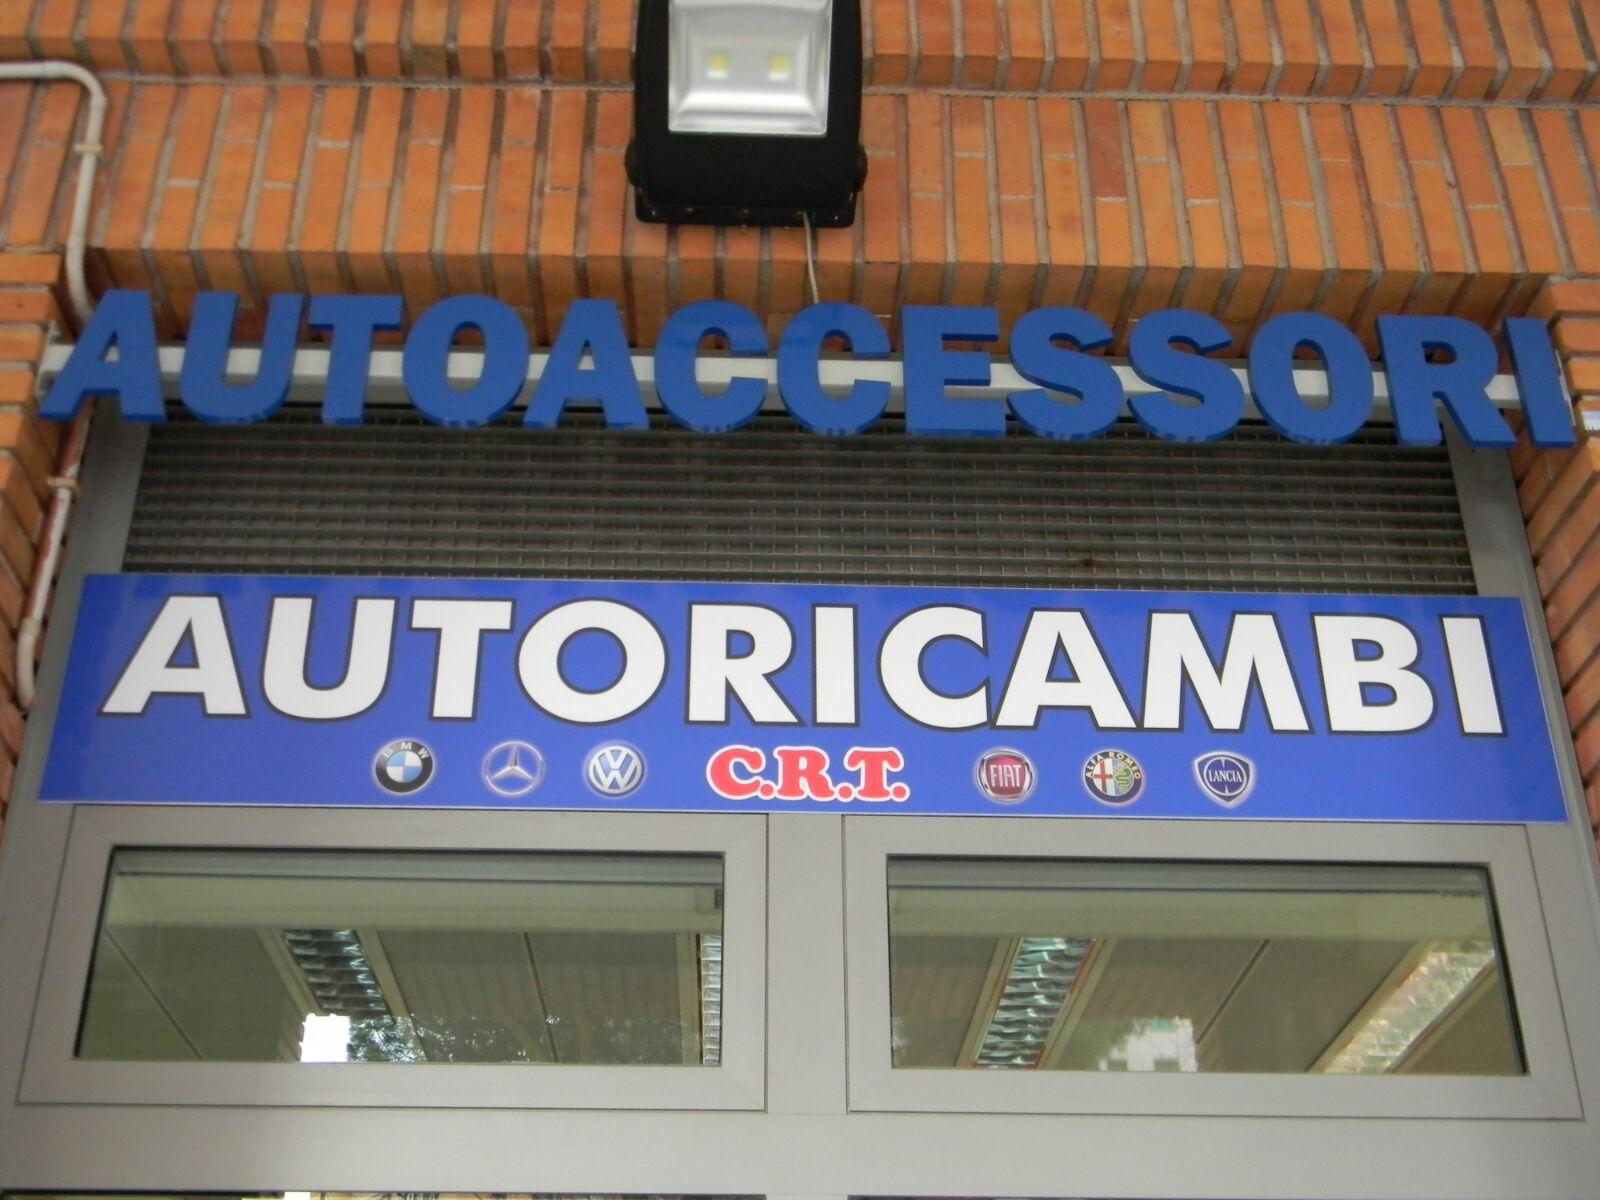 Autoricambi Roma Piazza Ragusa – Autoricambi C.R.T.